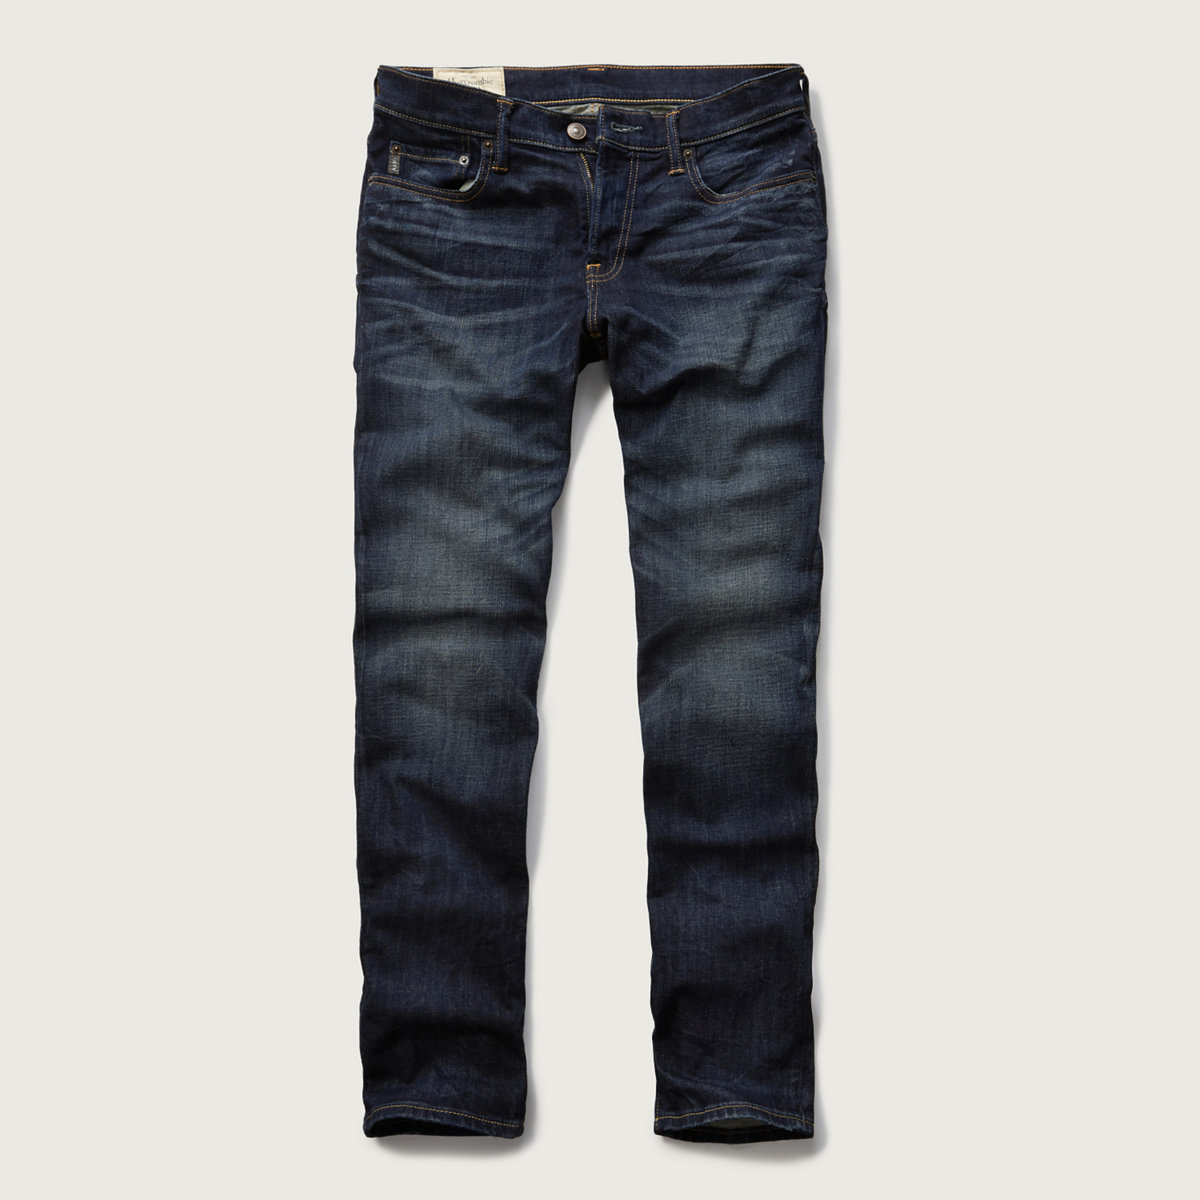 Skinny Everyday Stretch Jeans